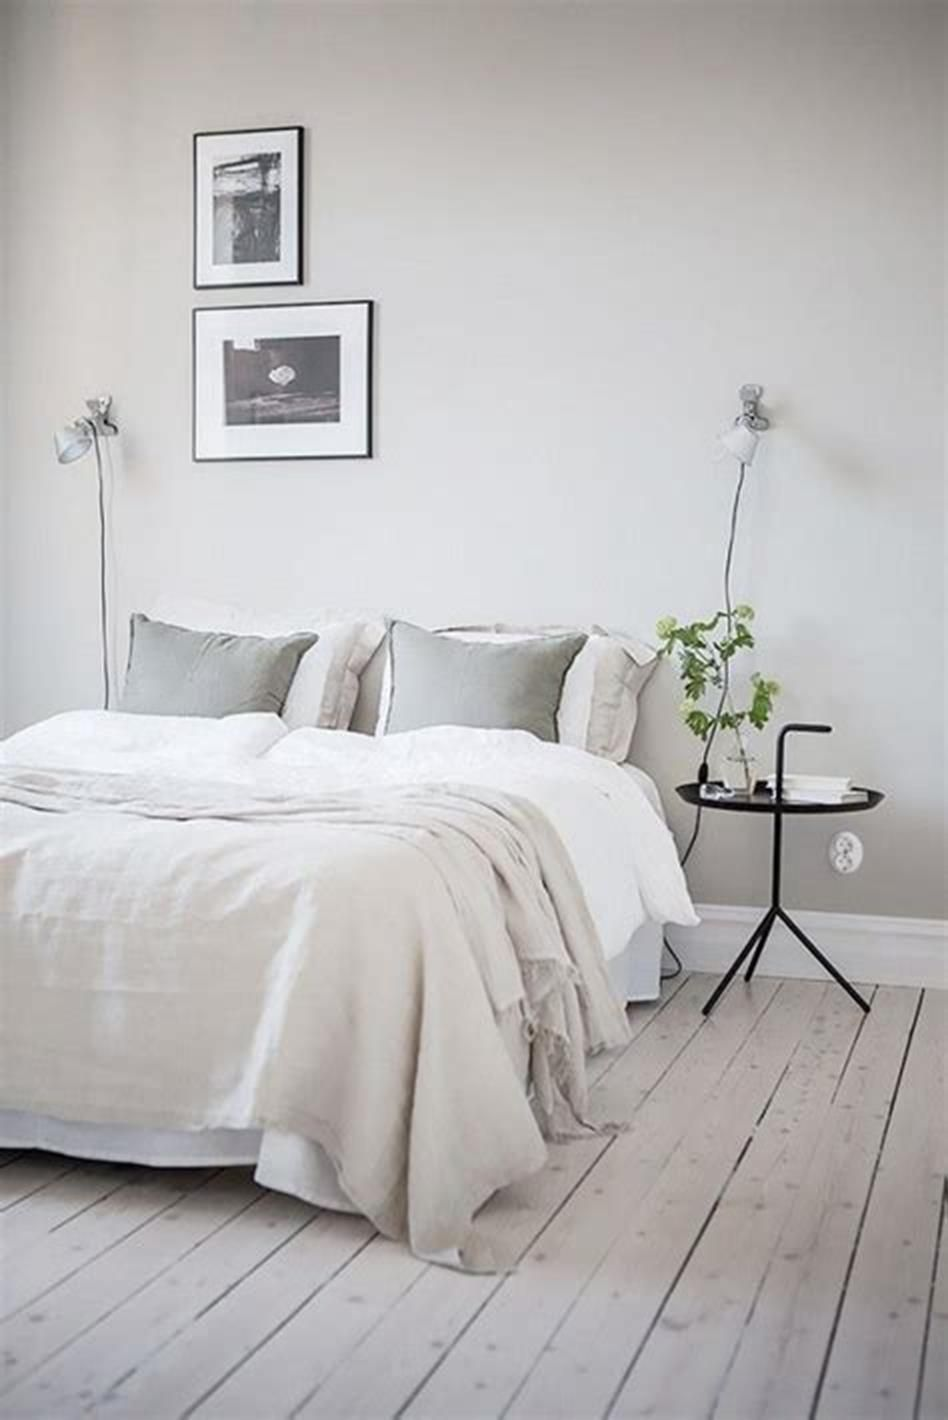 40 cozy minimalist bedroom decorating ideas in 2019 on cozy minimalist bedroom decorating ideas id=28879